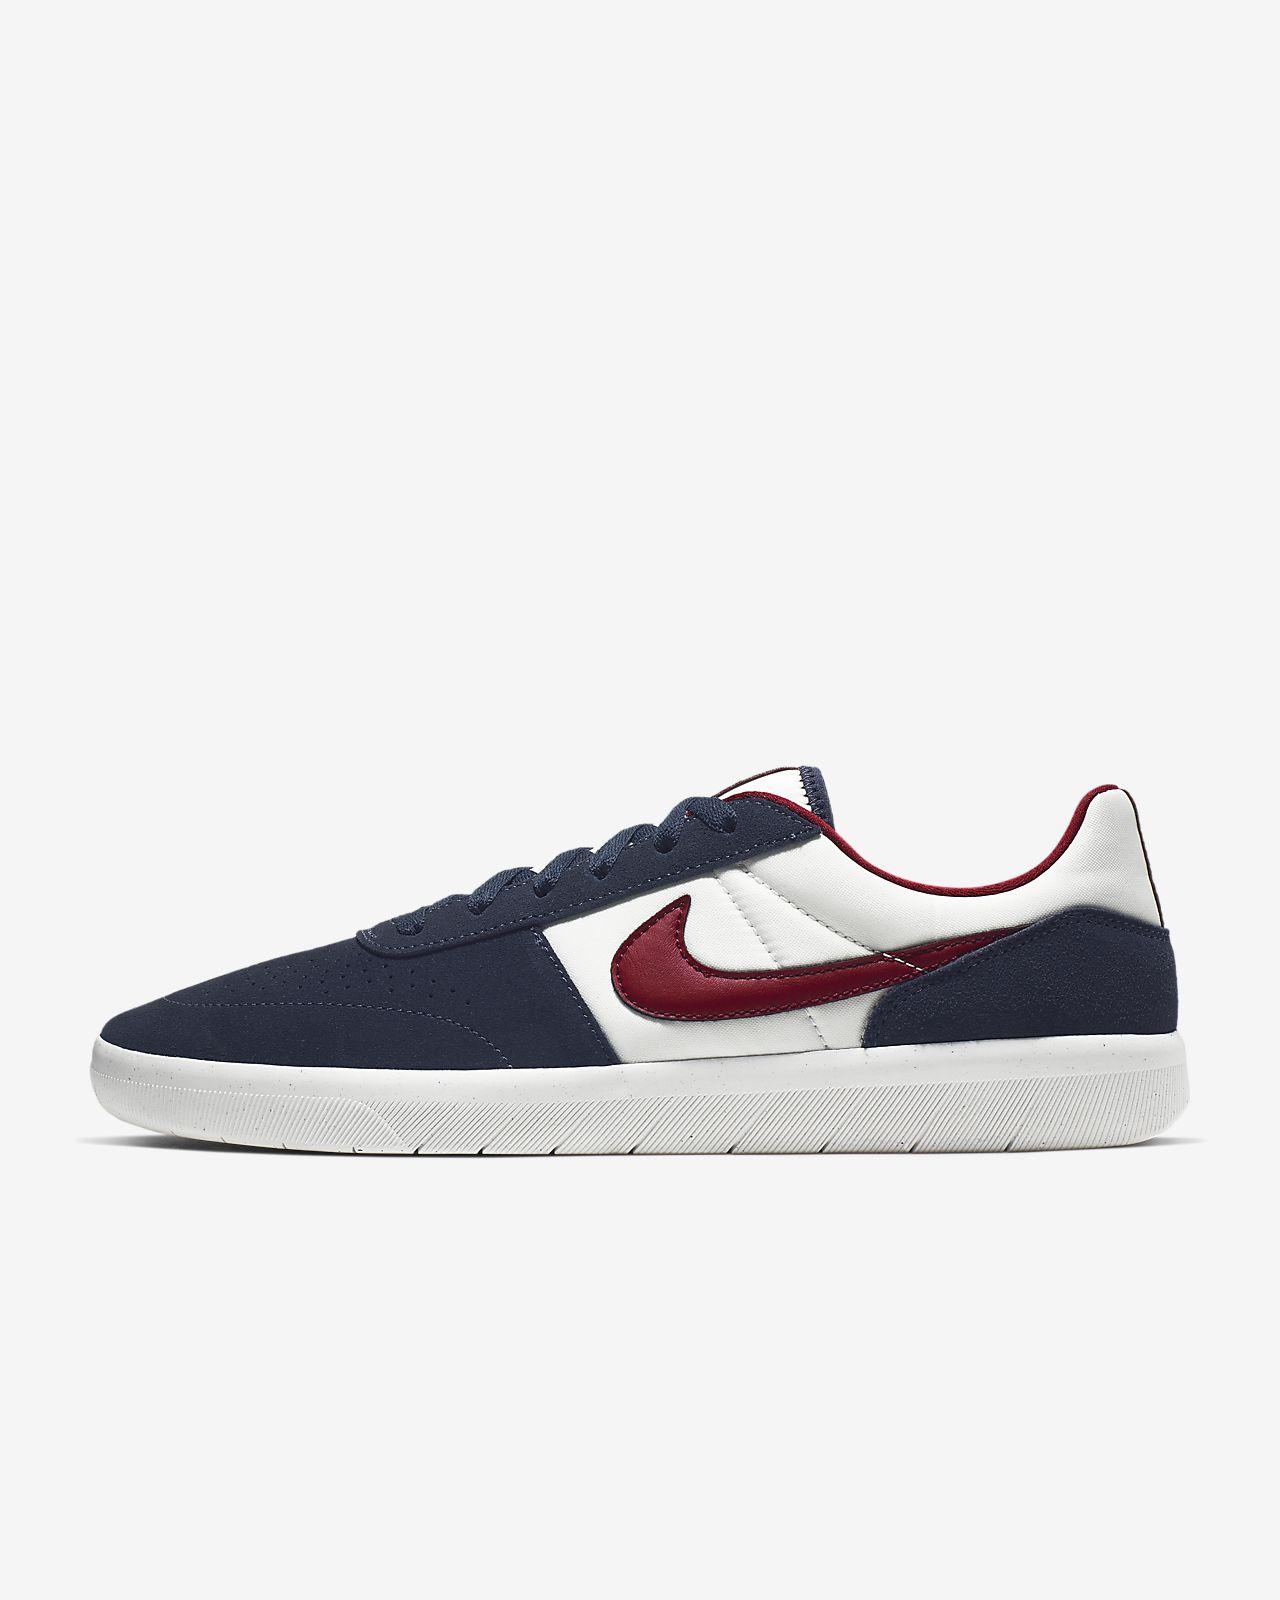 2nike scarpe sneakers uomo